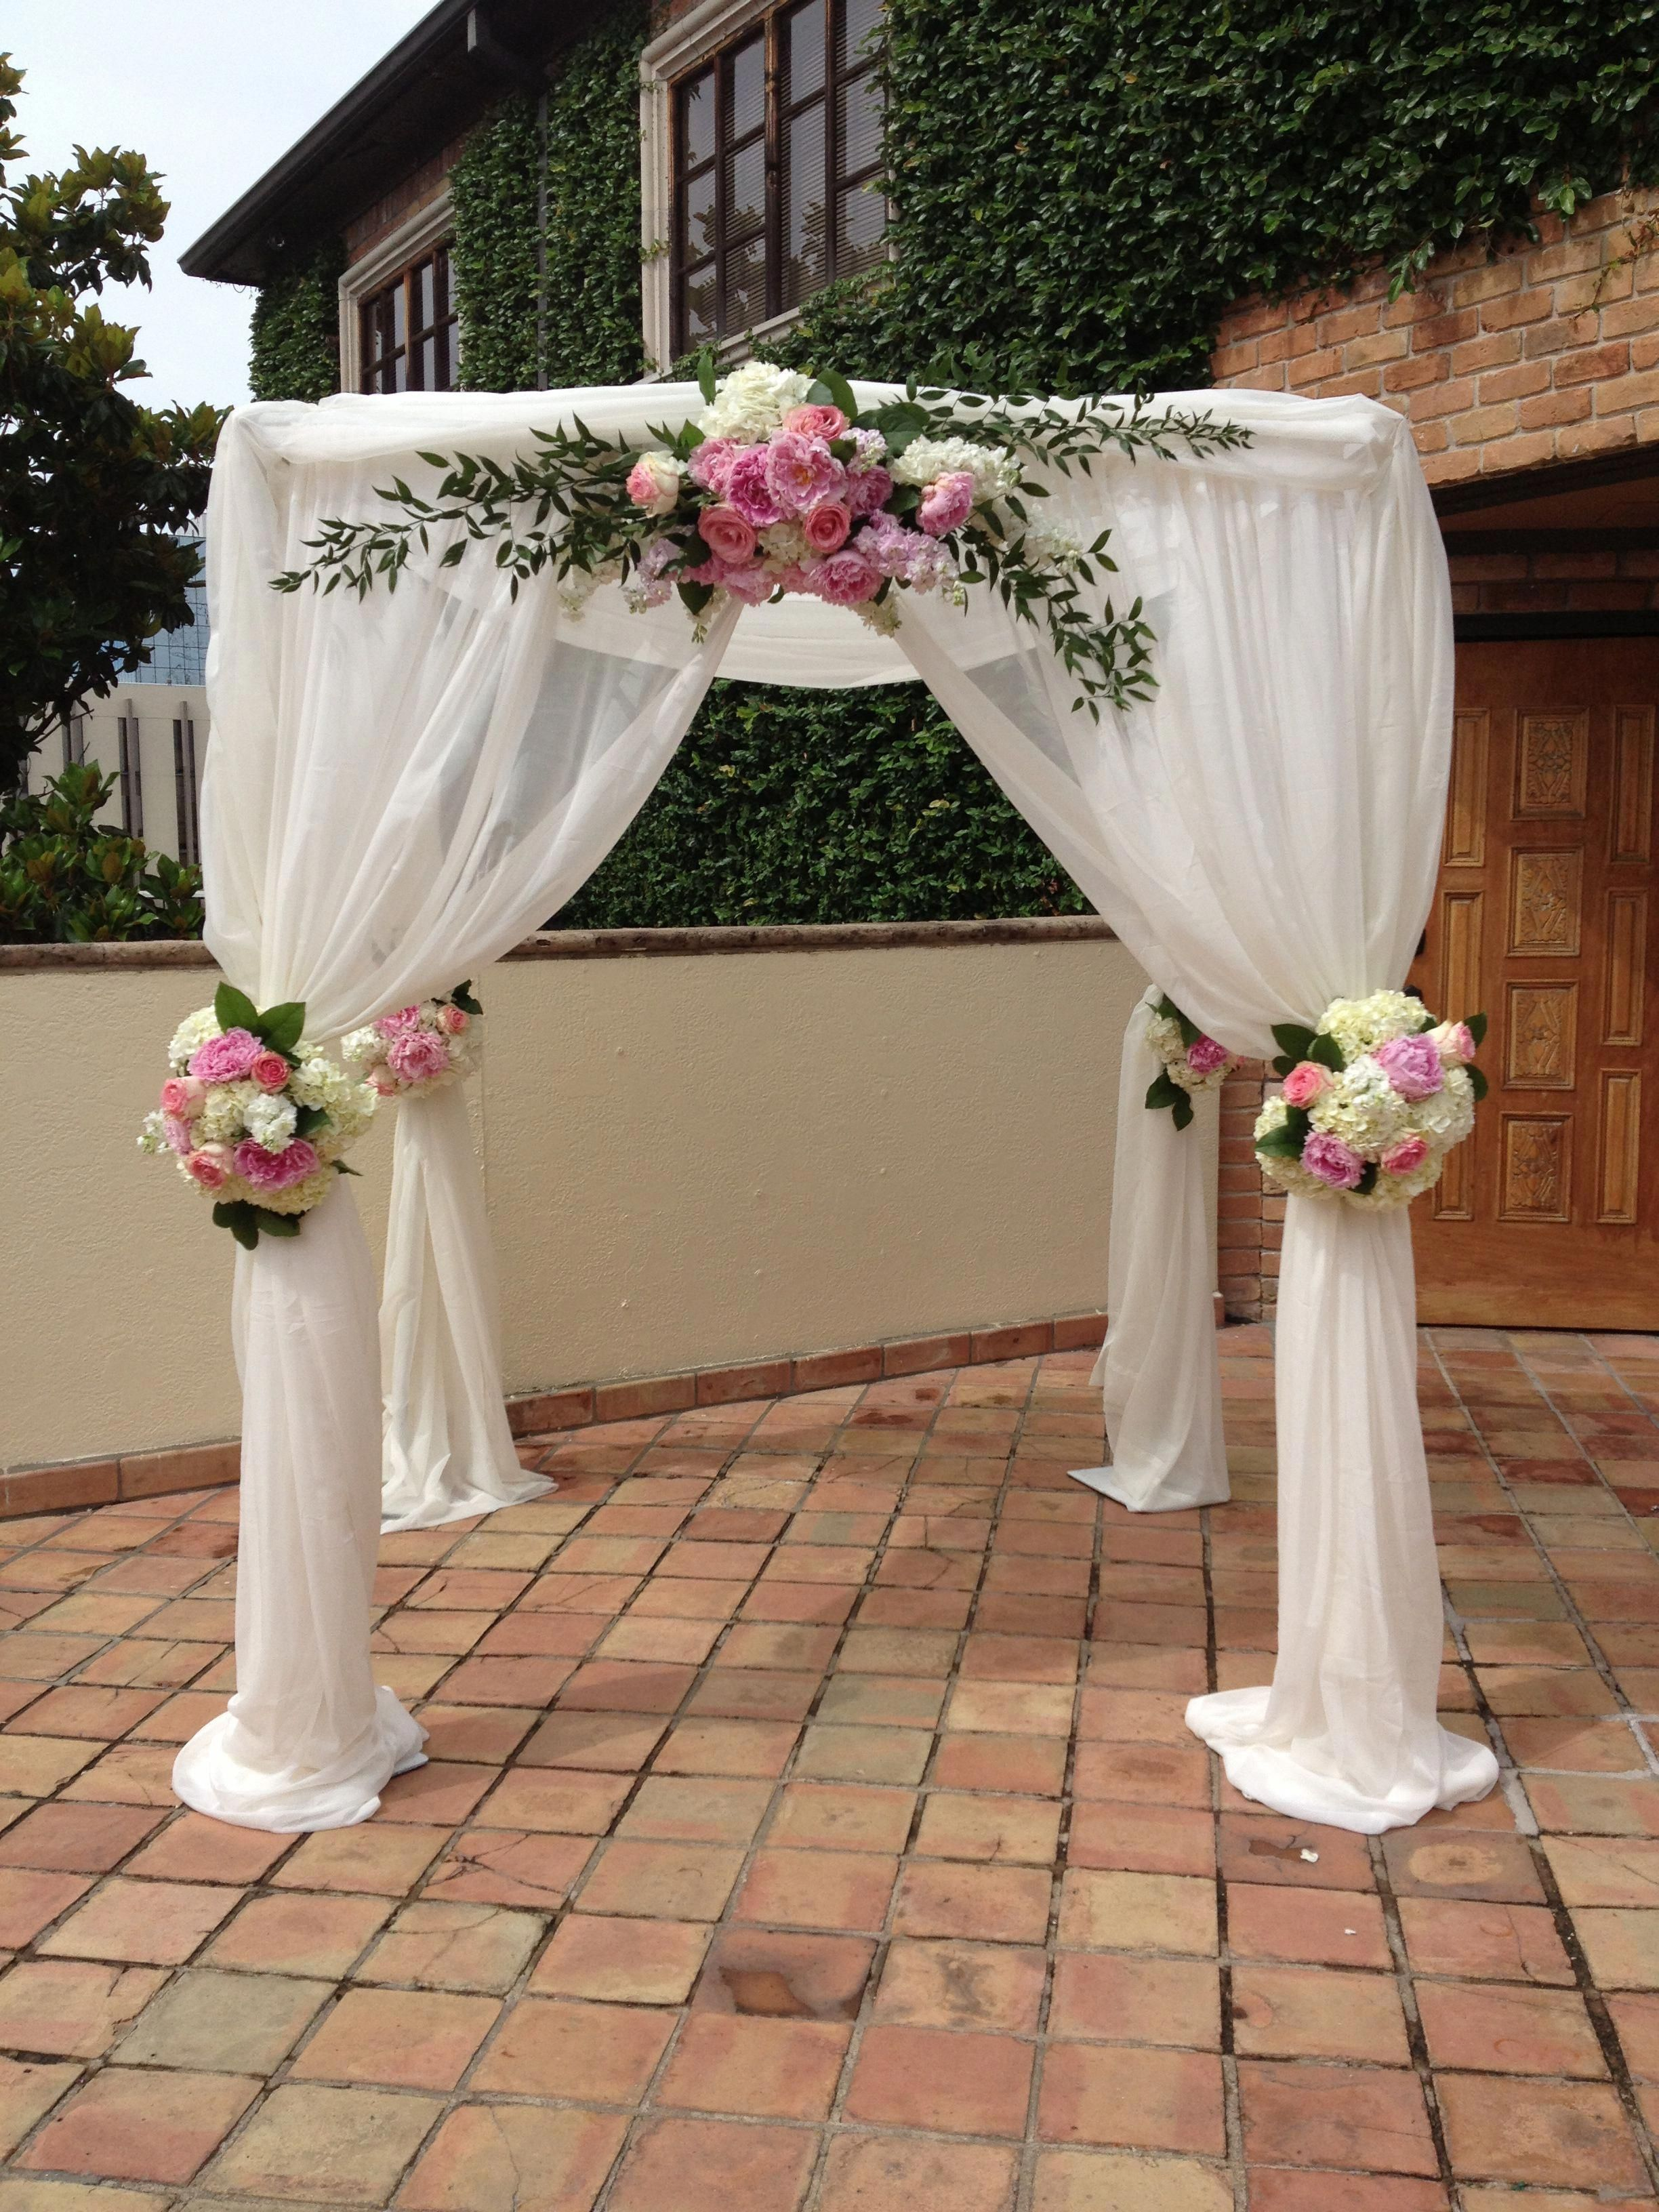 Wedding Gazebo Over Sweetheart Table At Reception Pergoladeck